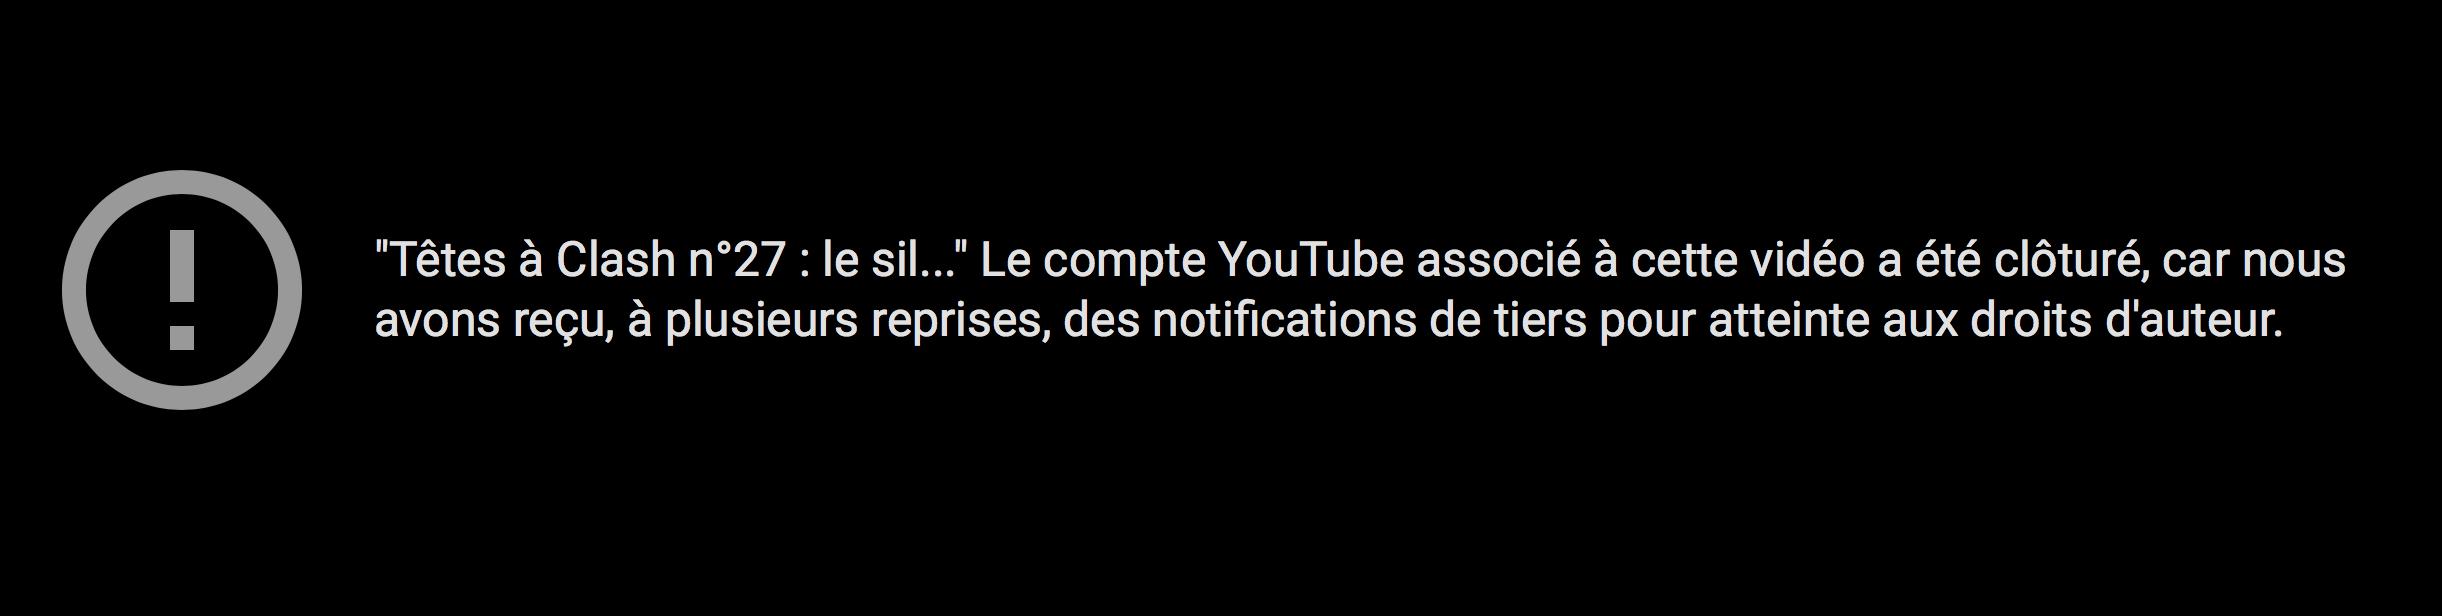 Youtube a fermé la chaîne de TV libertés !